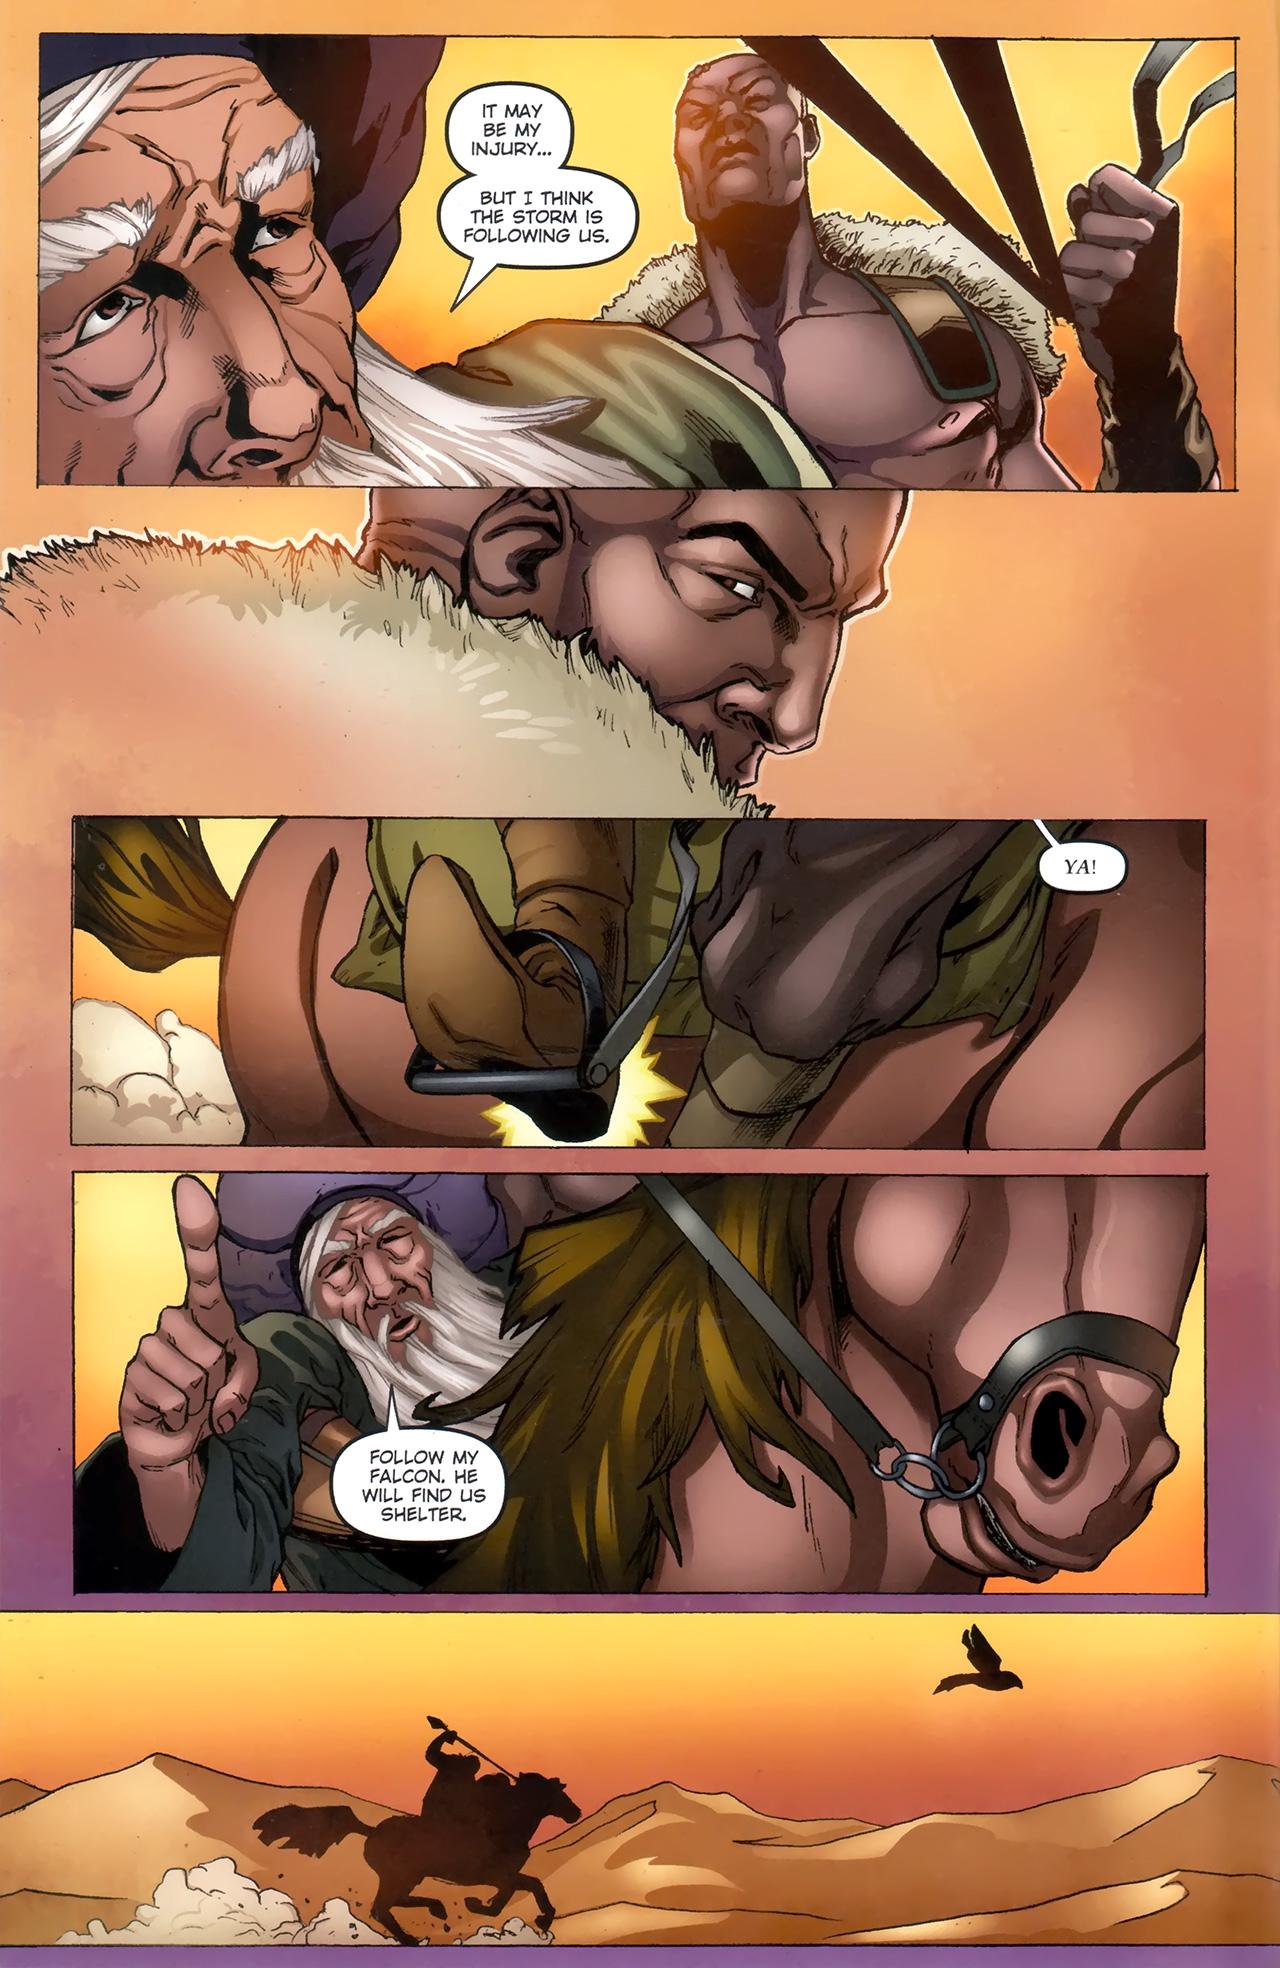 Read online 1001 Arabian Nights: The Adventures of Sinbad comic -  Issue #11 - 4